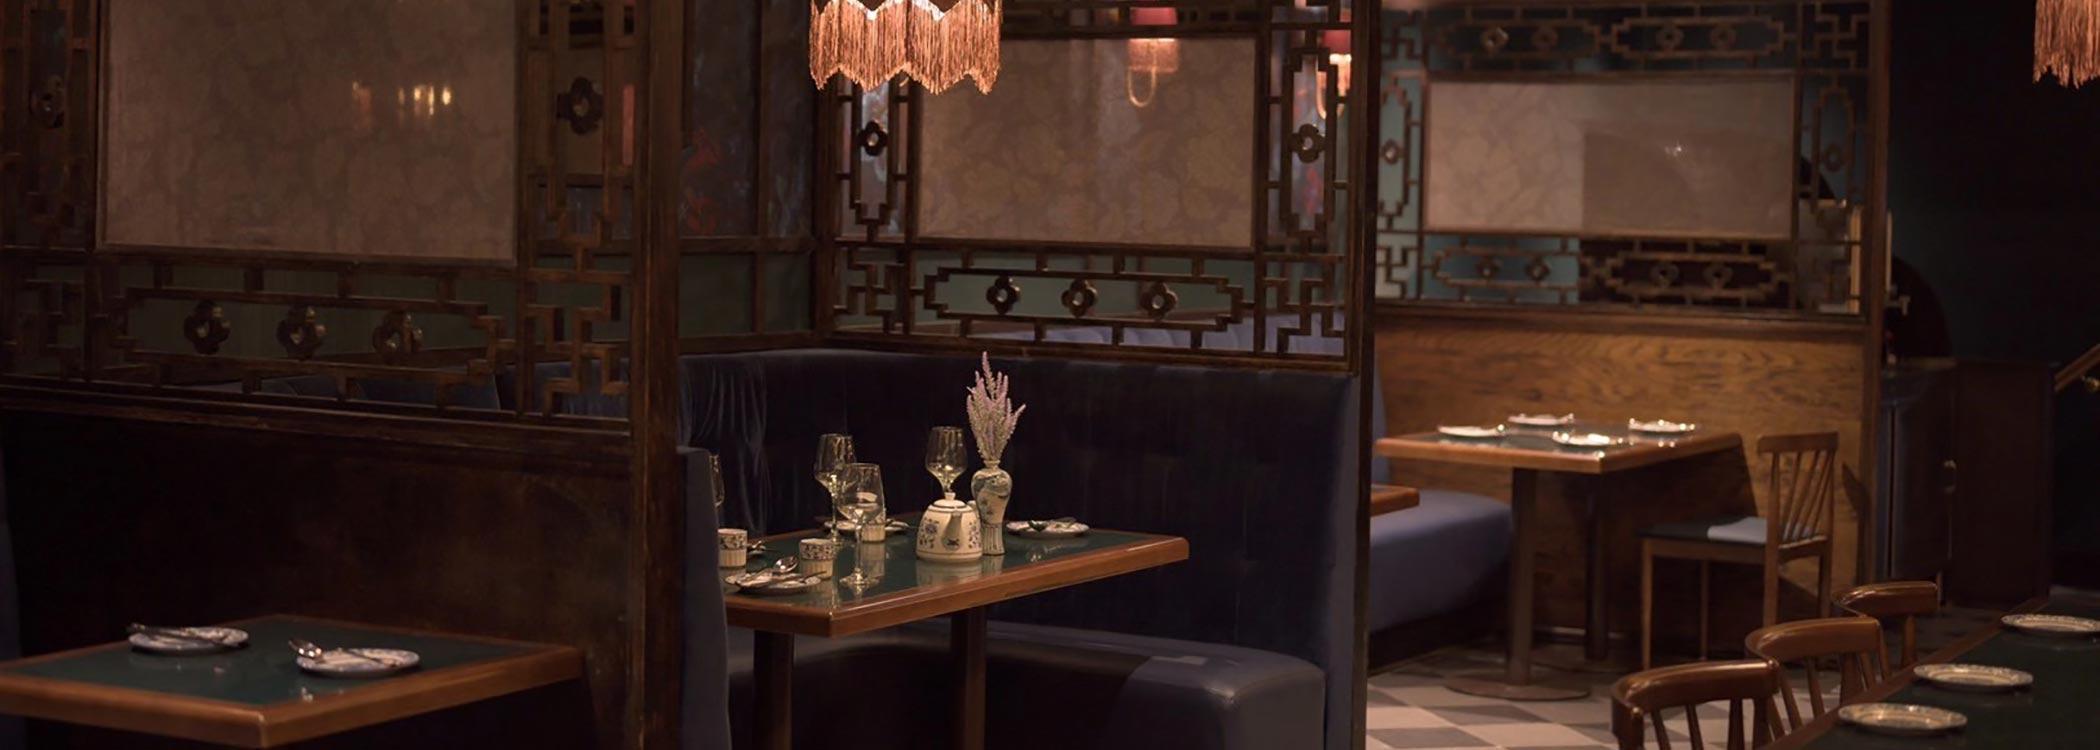 Facing The Uncertain Future Of Midtown Manhattan Dining